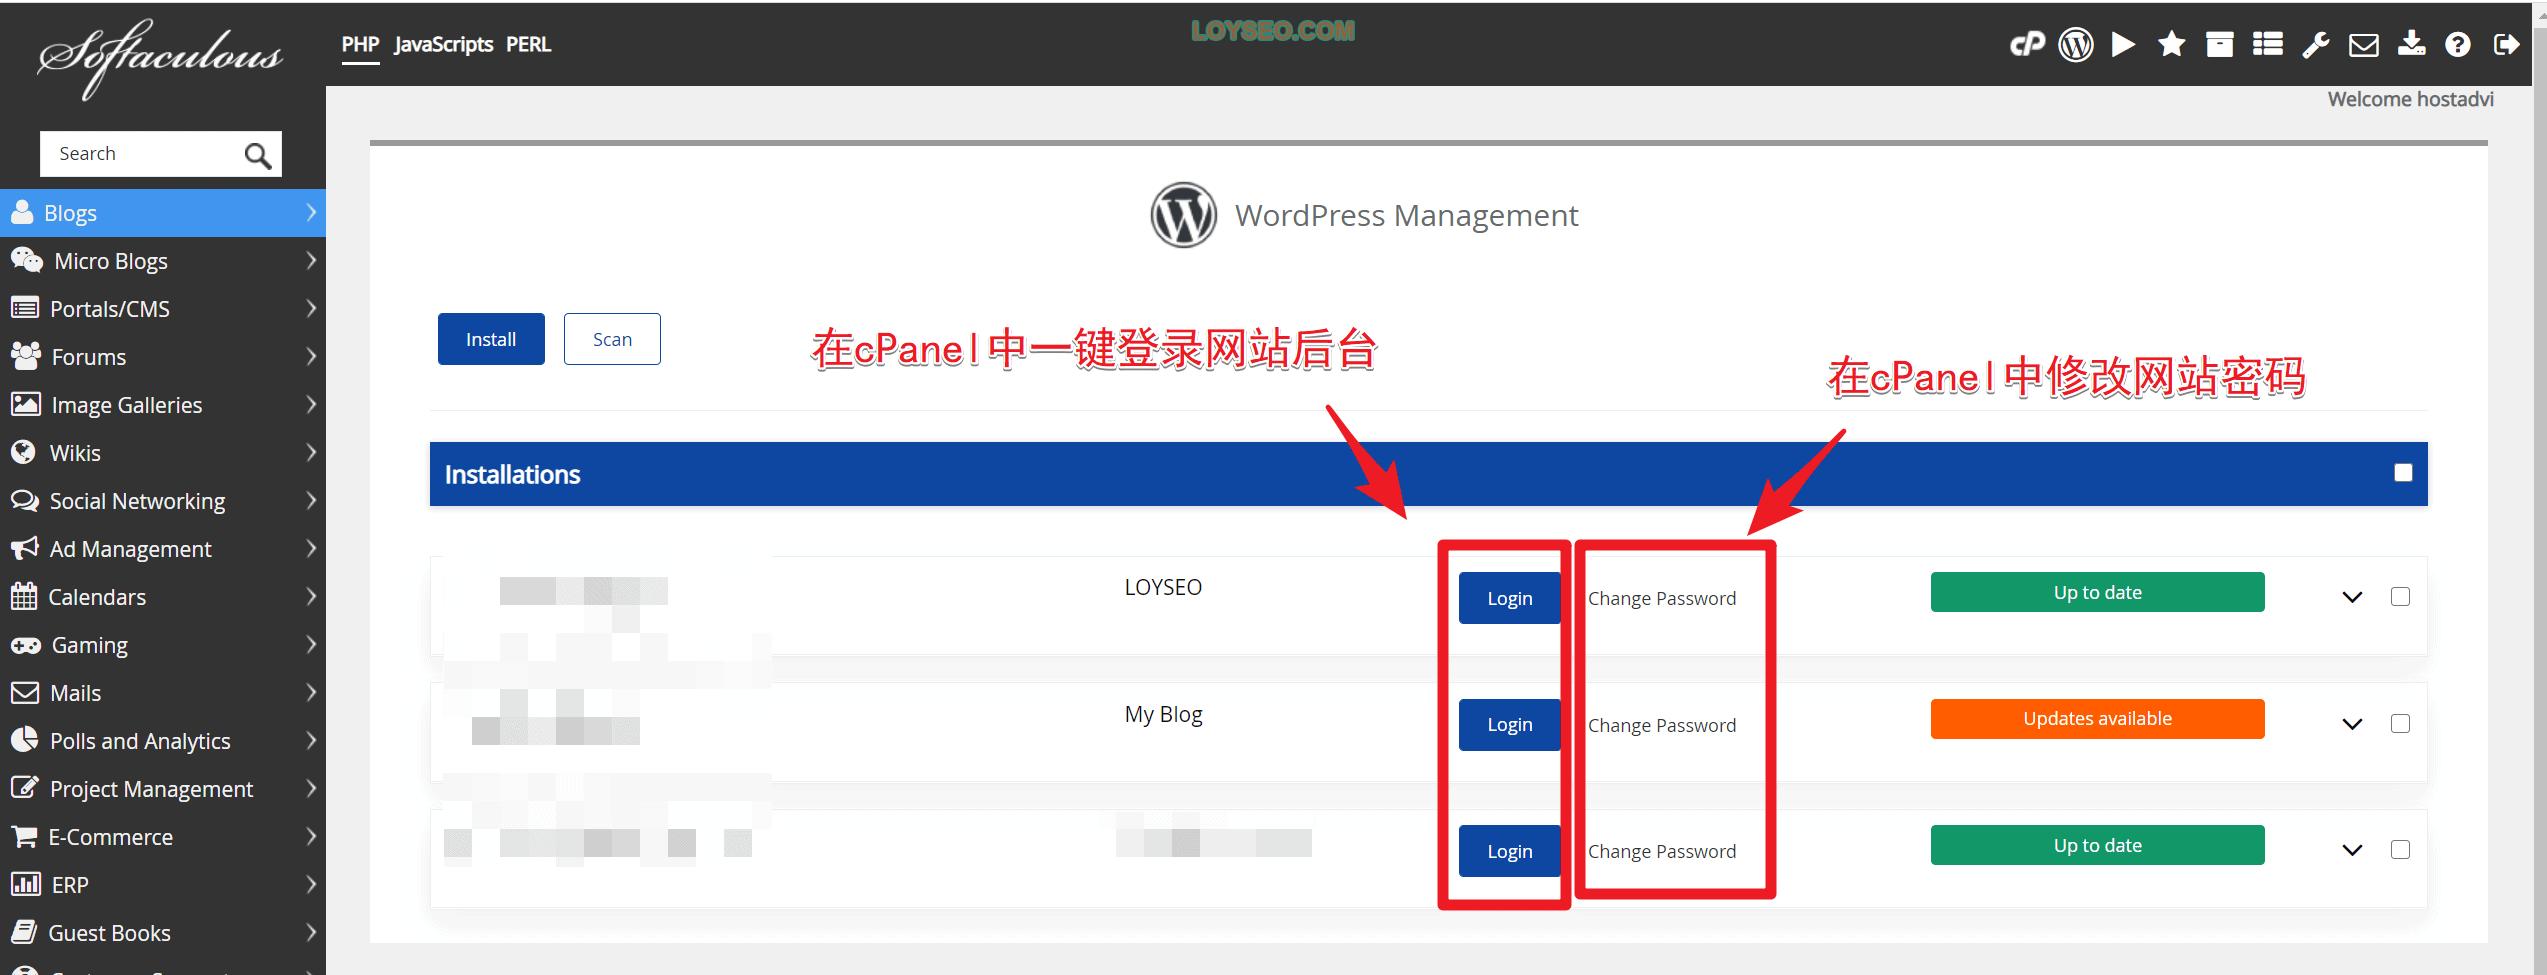 image 18 - WordPress教程 - WordPress新手指南(2021)